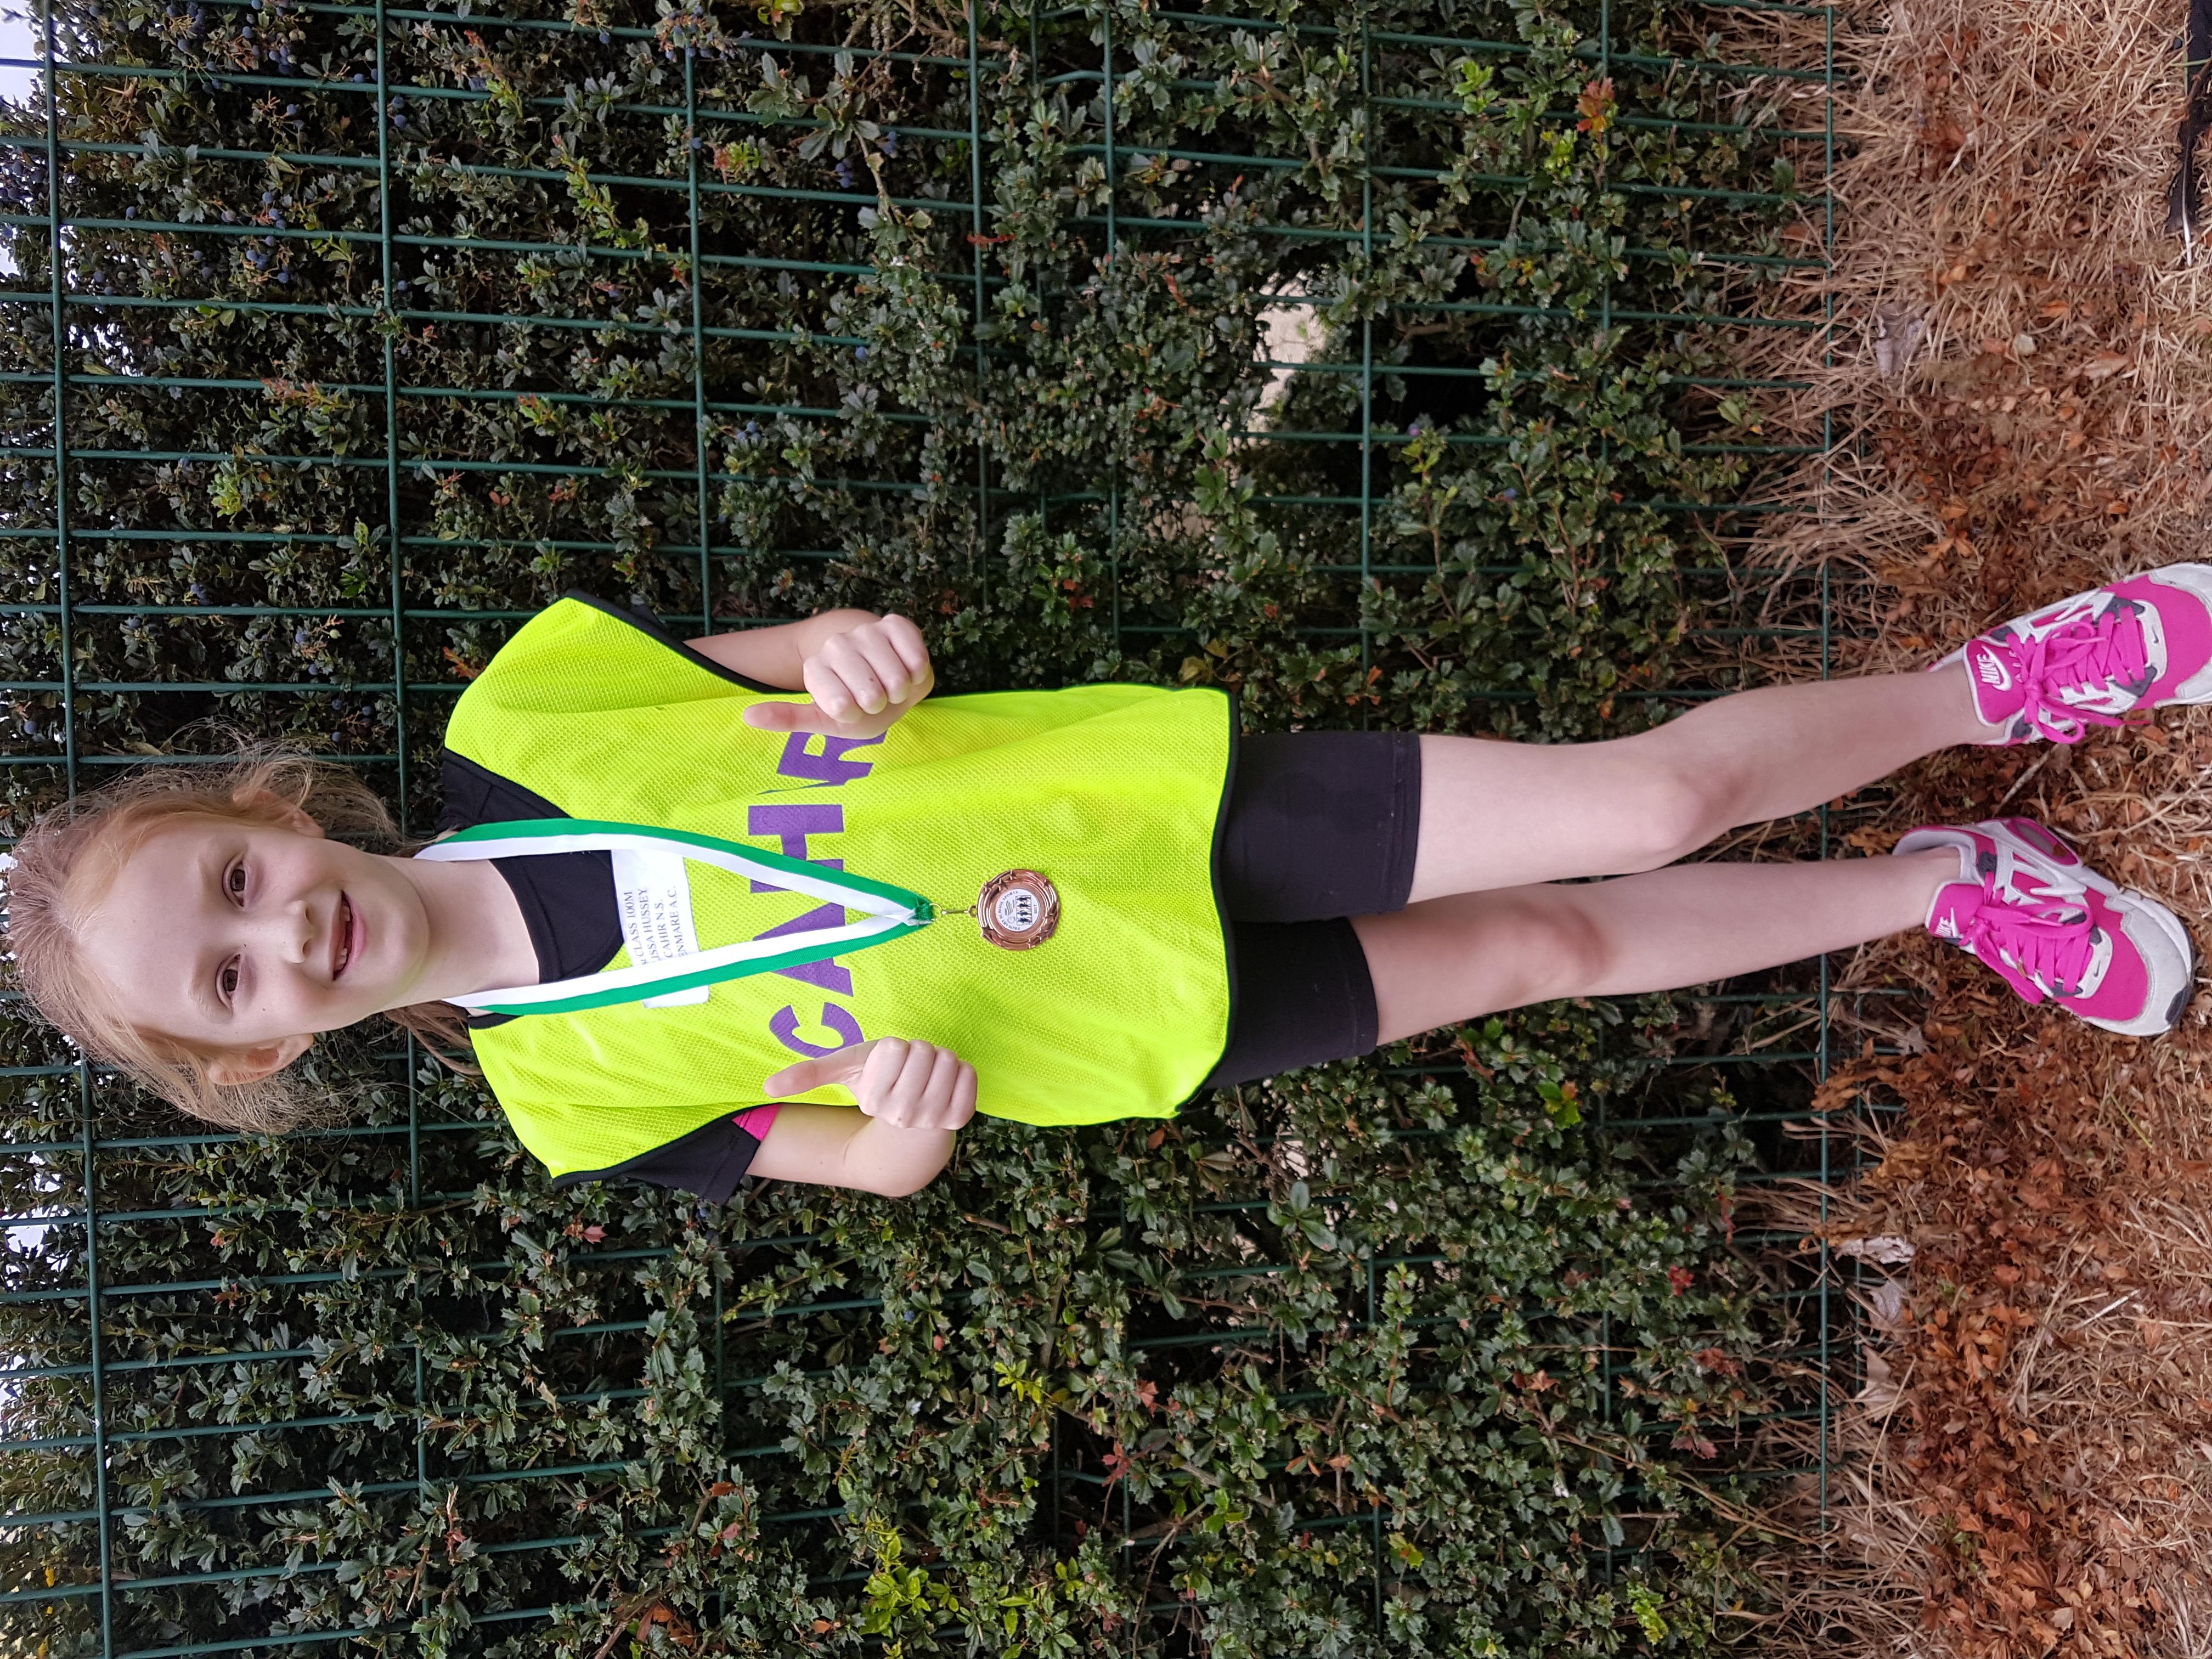 Elissa Hussey bronze medal winner